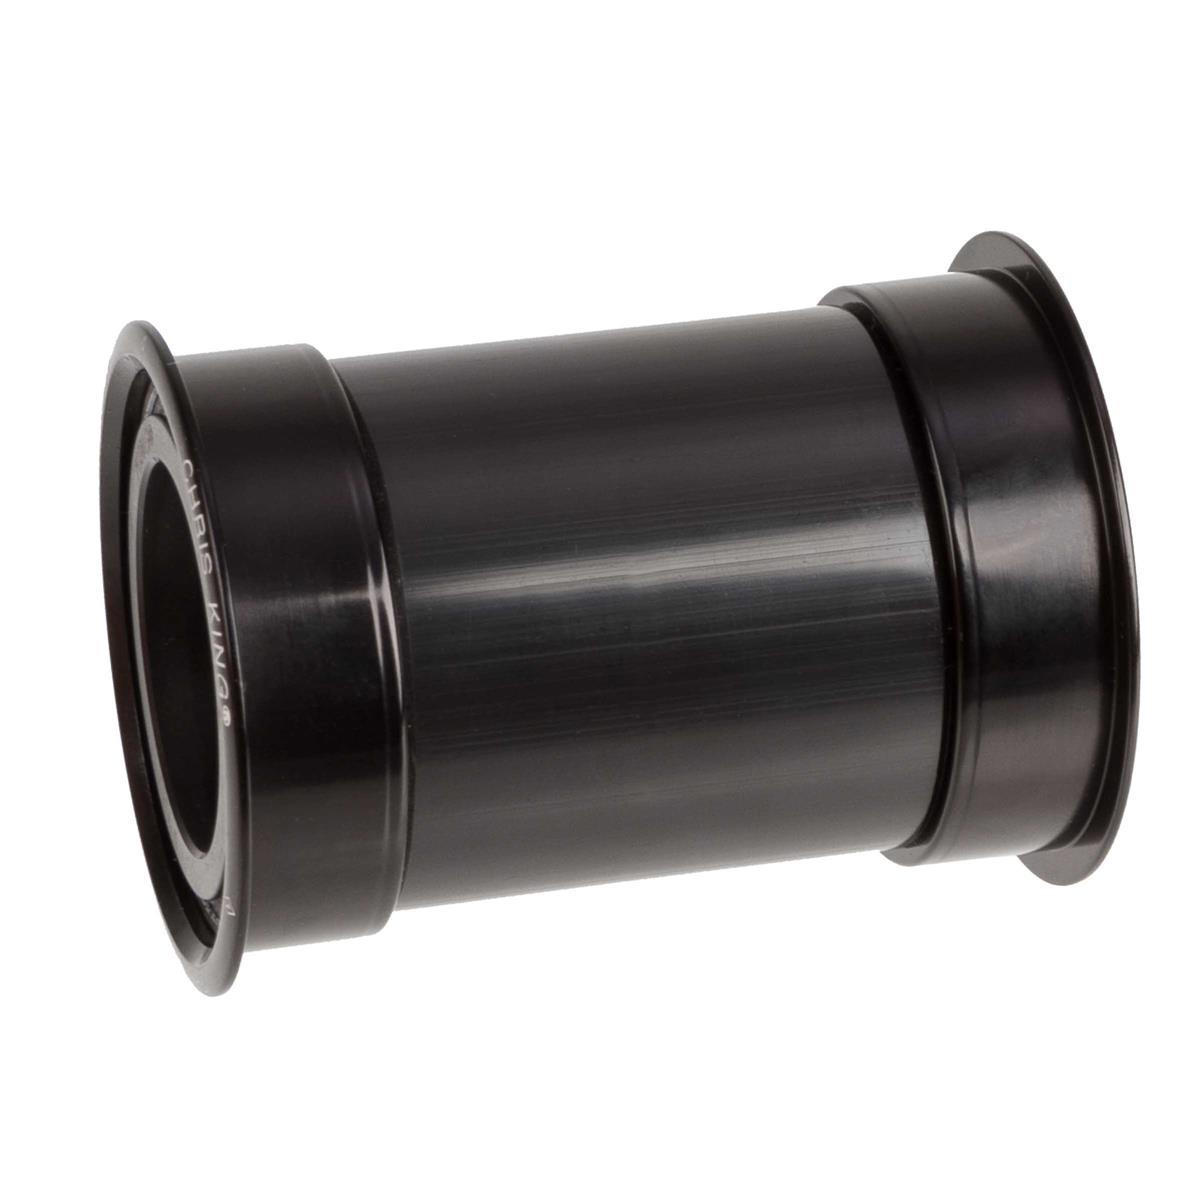 Chris King MTB-Innenlager Pressfit 30 mm, Schwarz